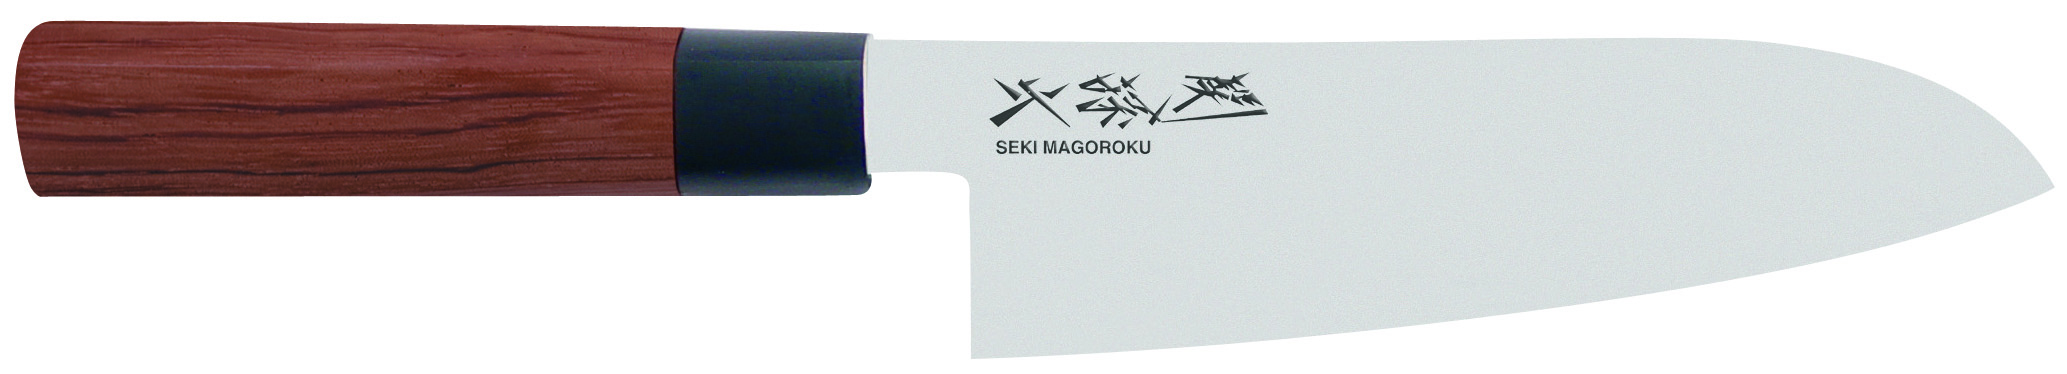 Nôž Seki Magoroku Santoku MGR-170S